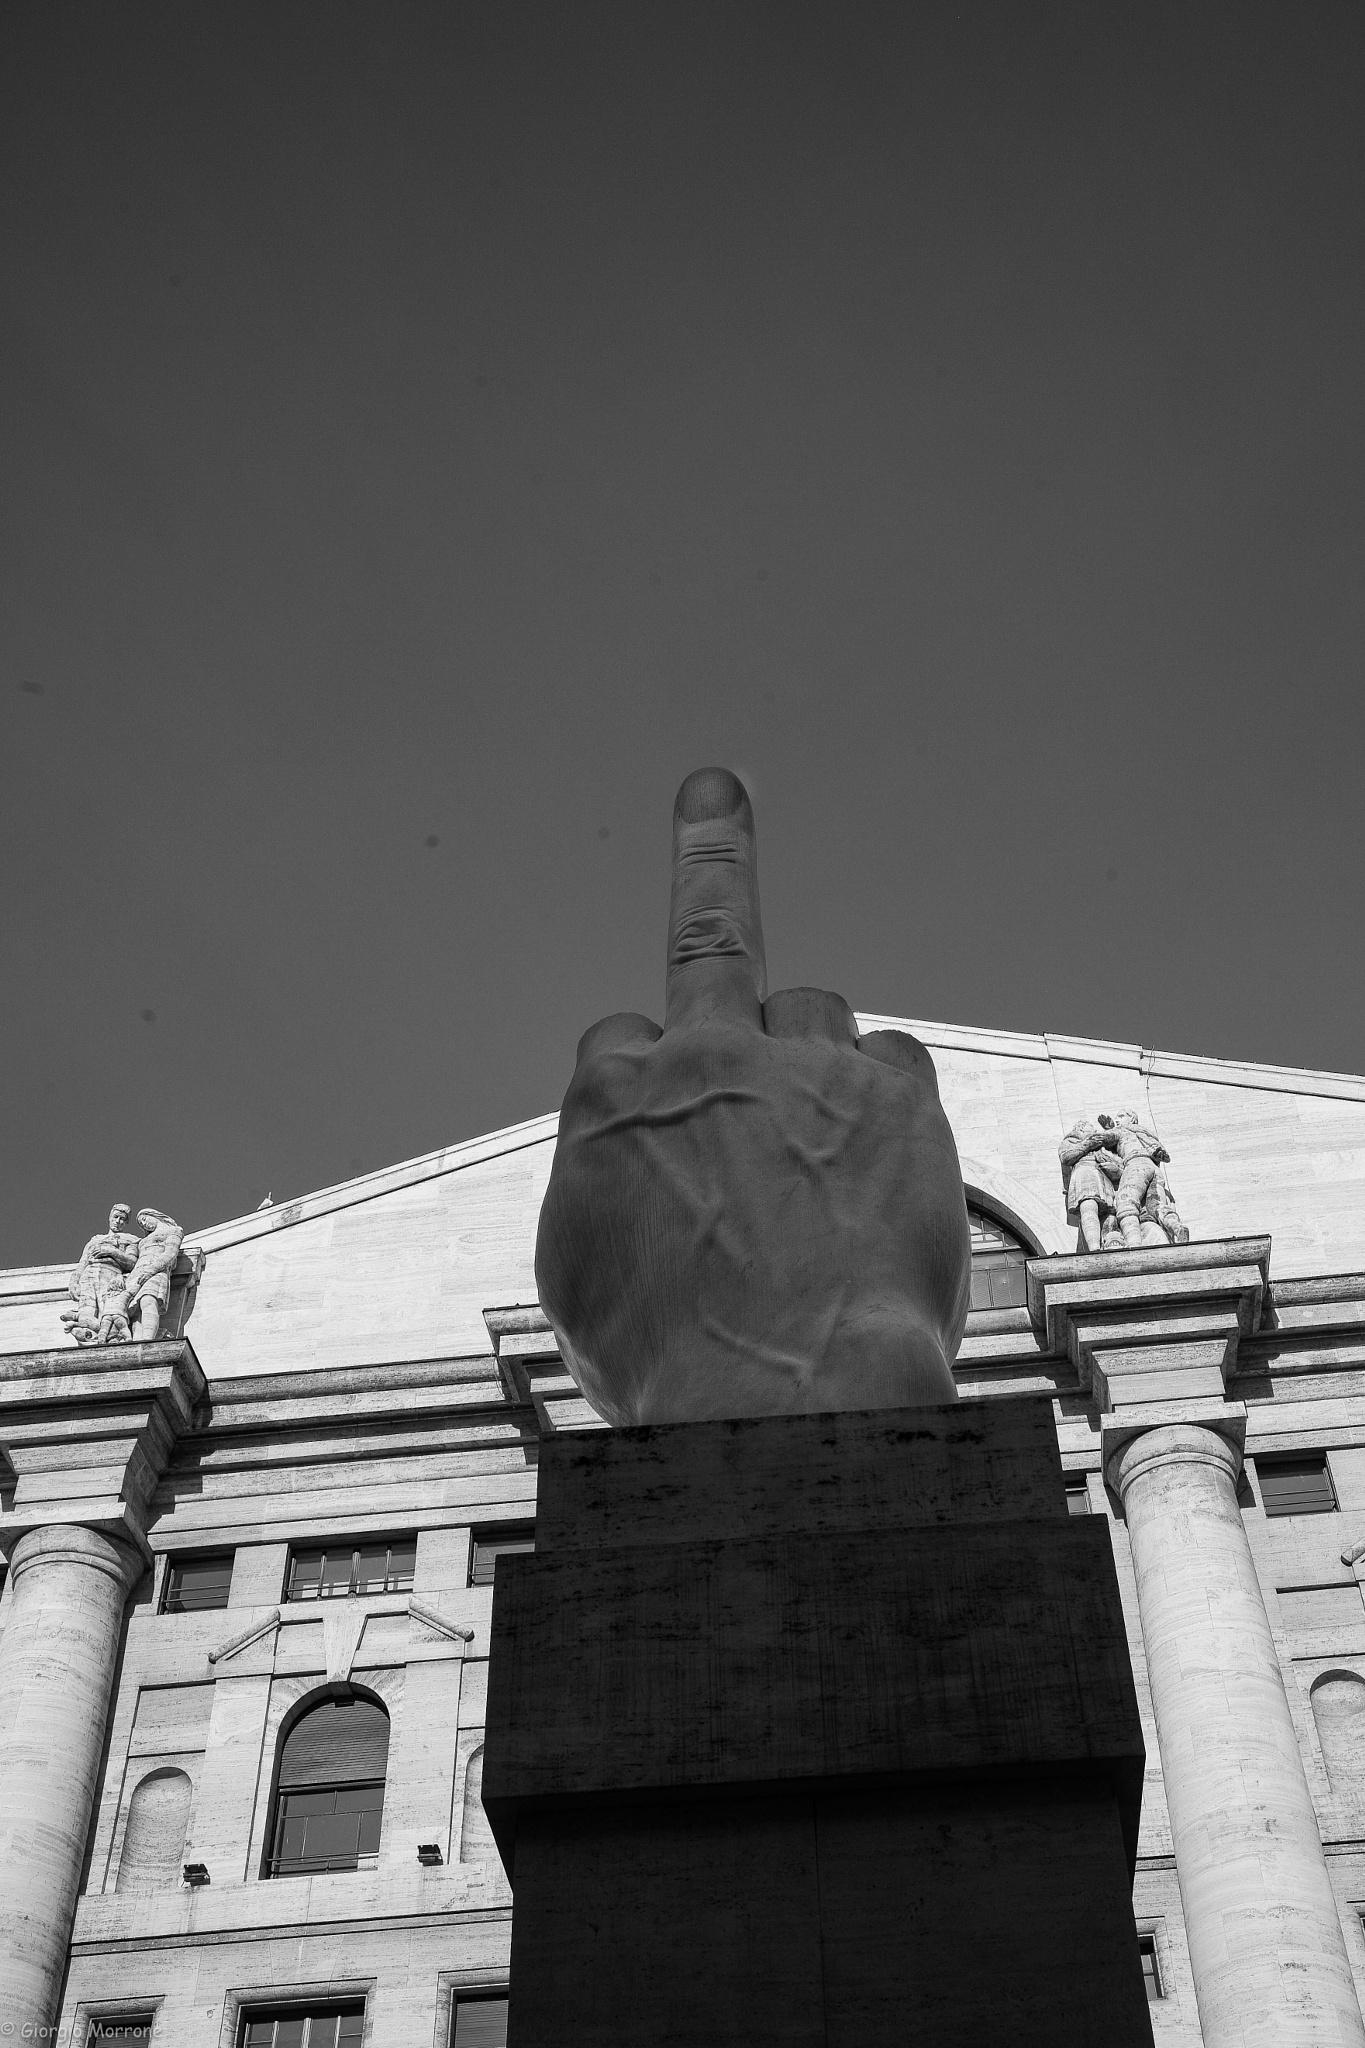 The finger by giorgiomorrone